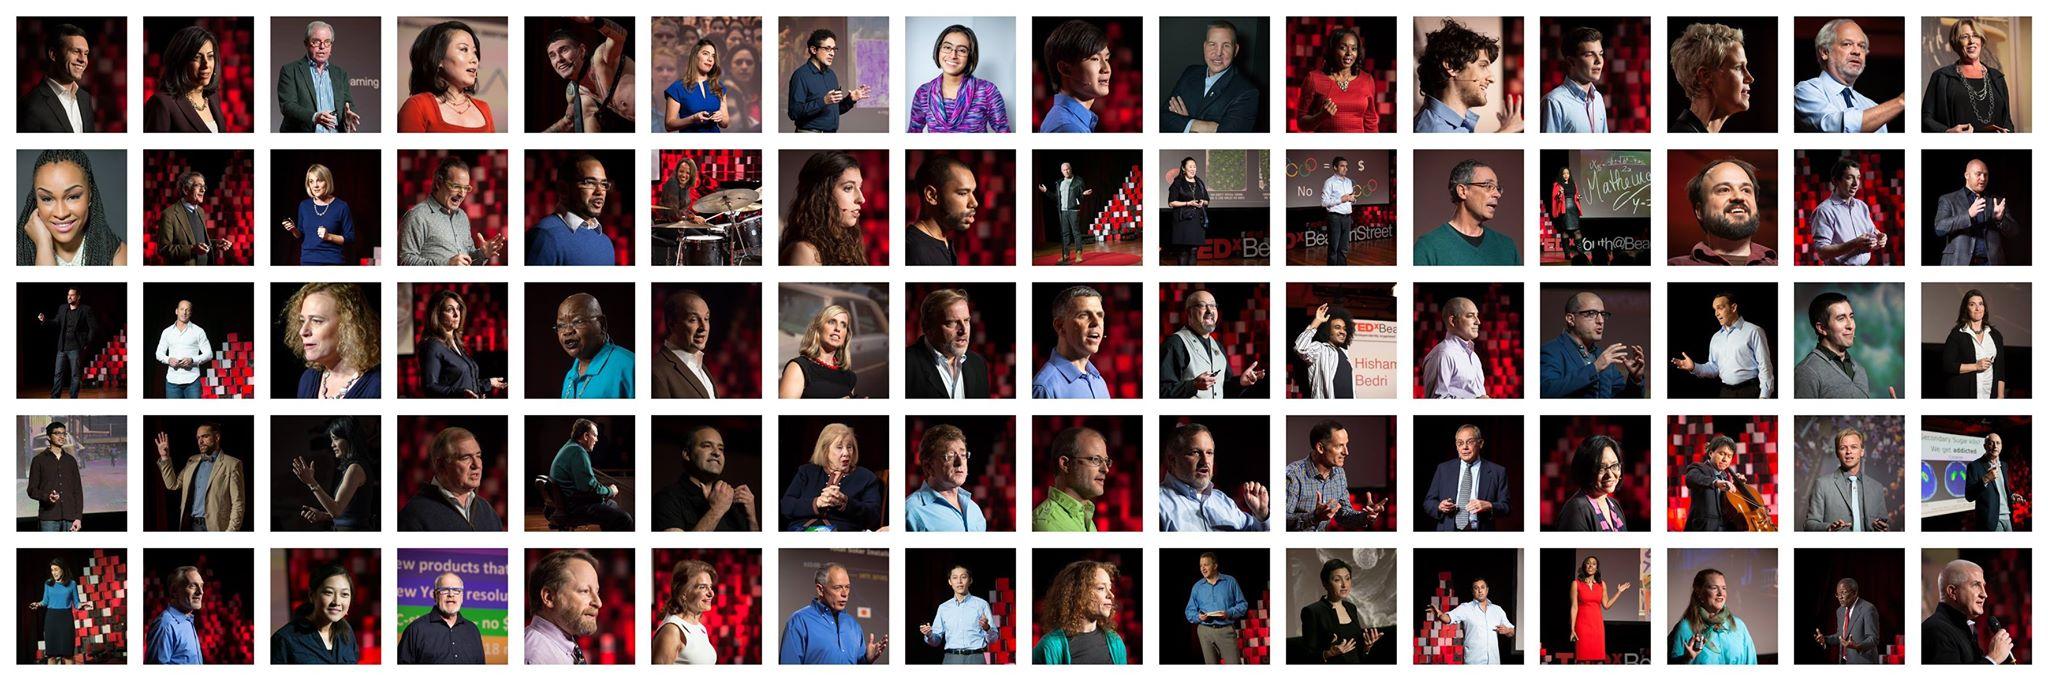 TEDxBeaconStreet_2015